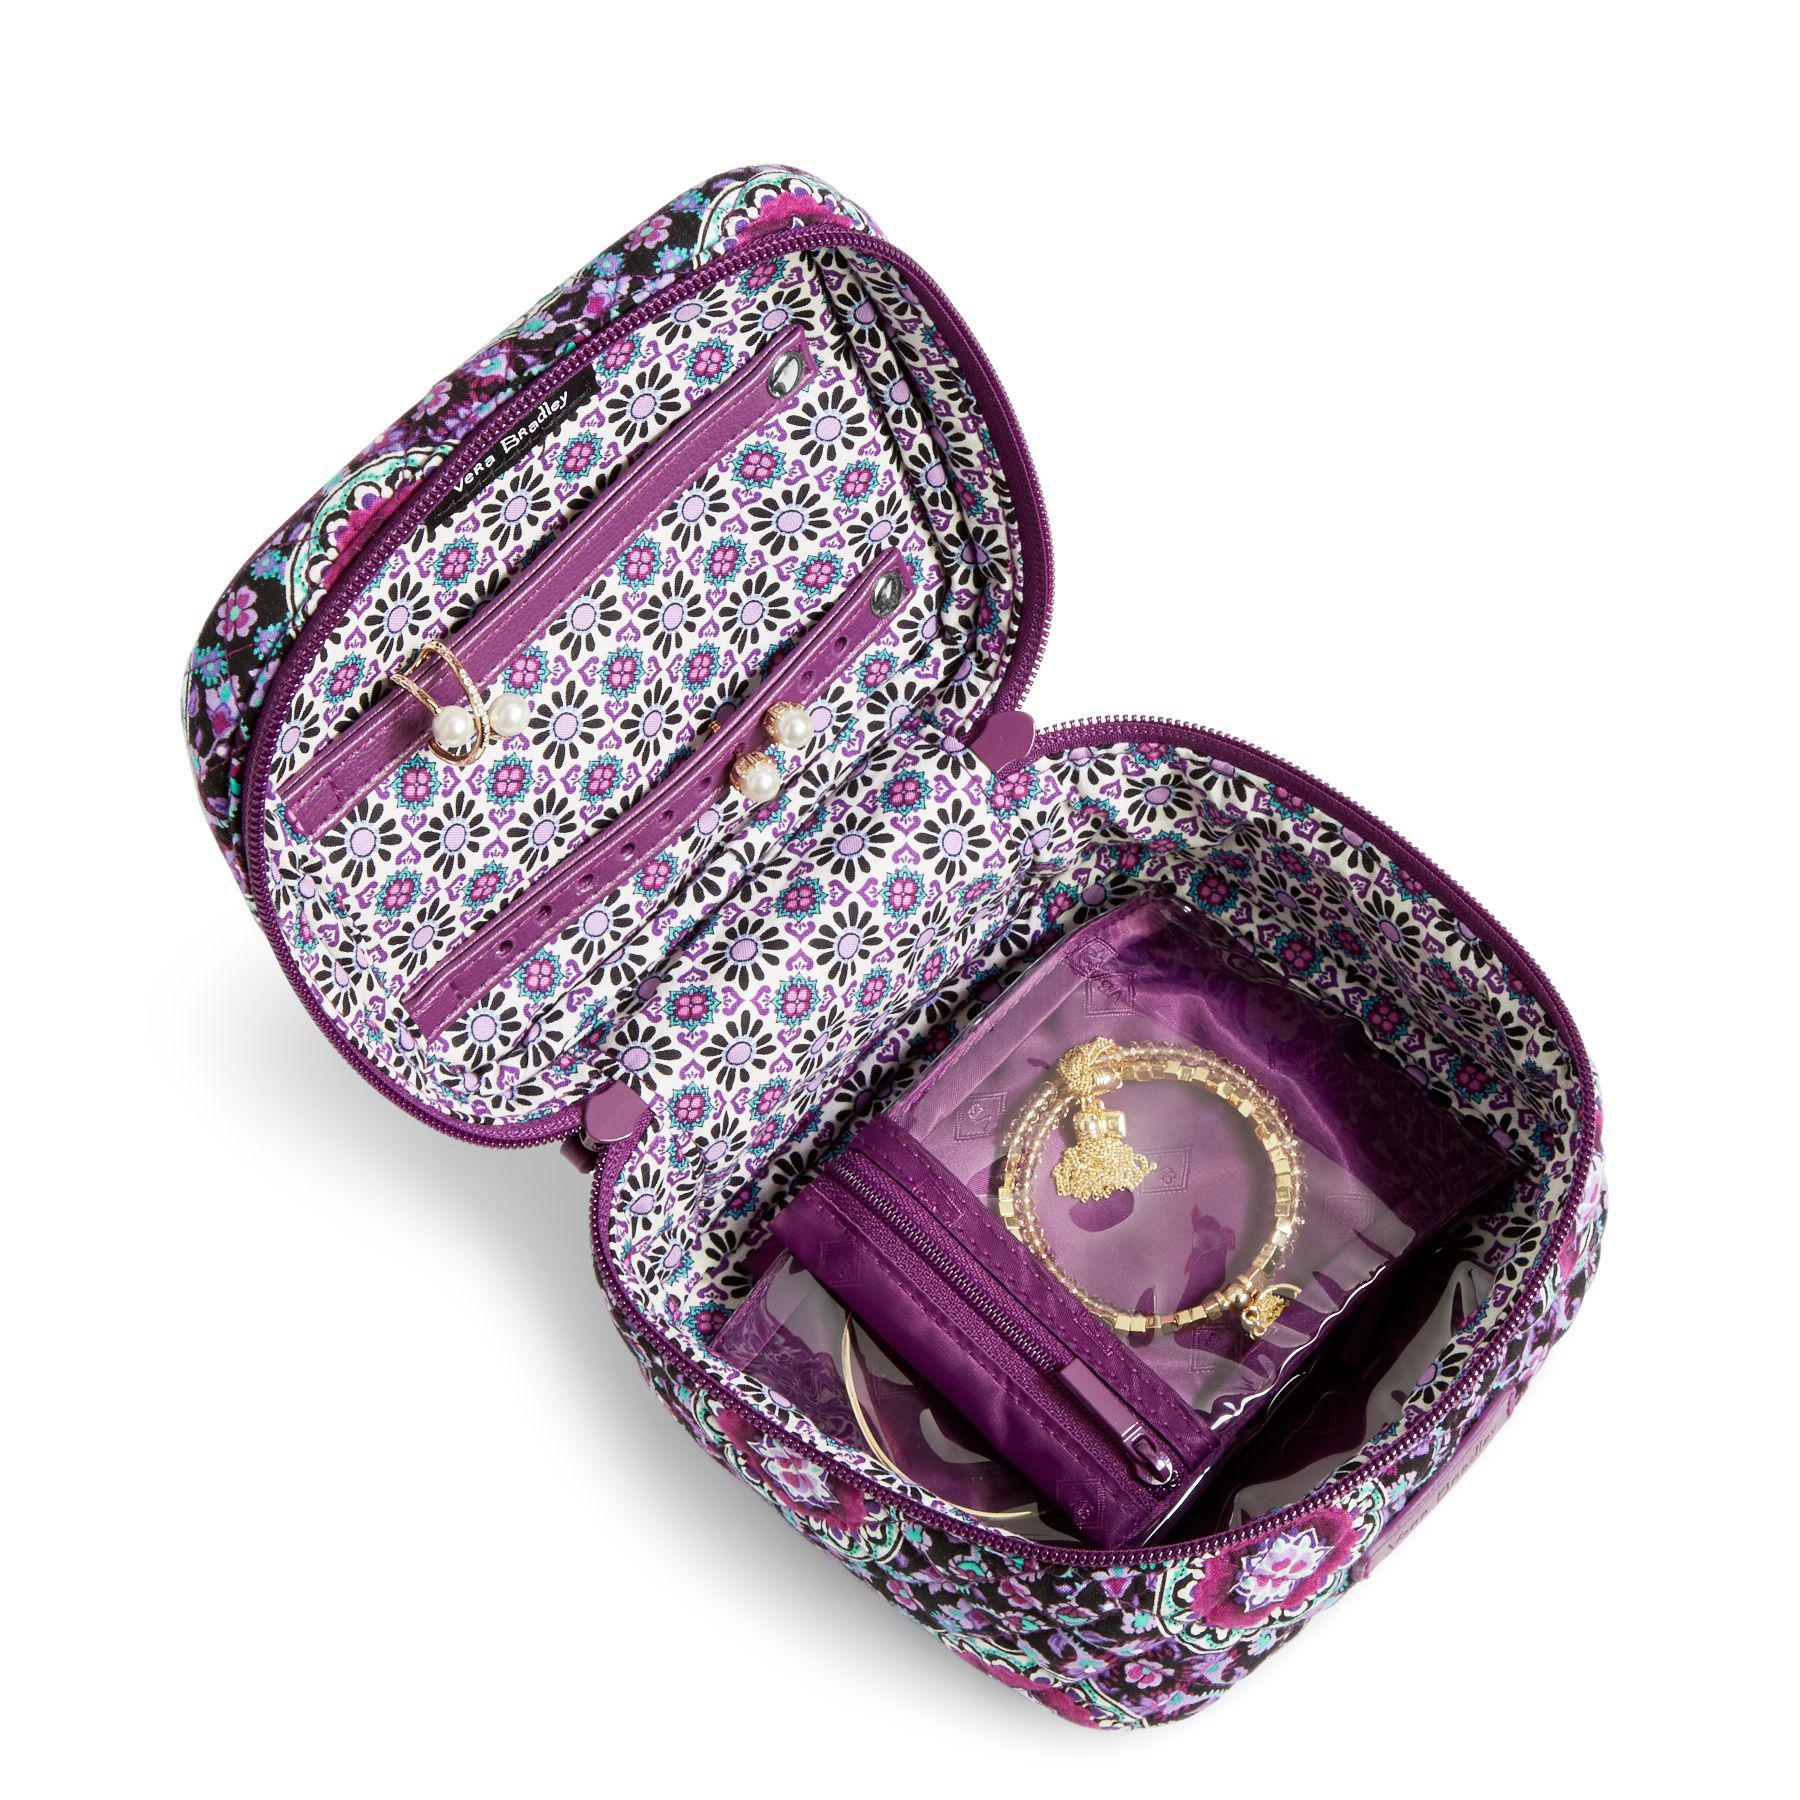 Vera Bradley Cotton Iconic Jewelry Case in Purple - Lyst